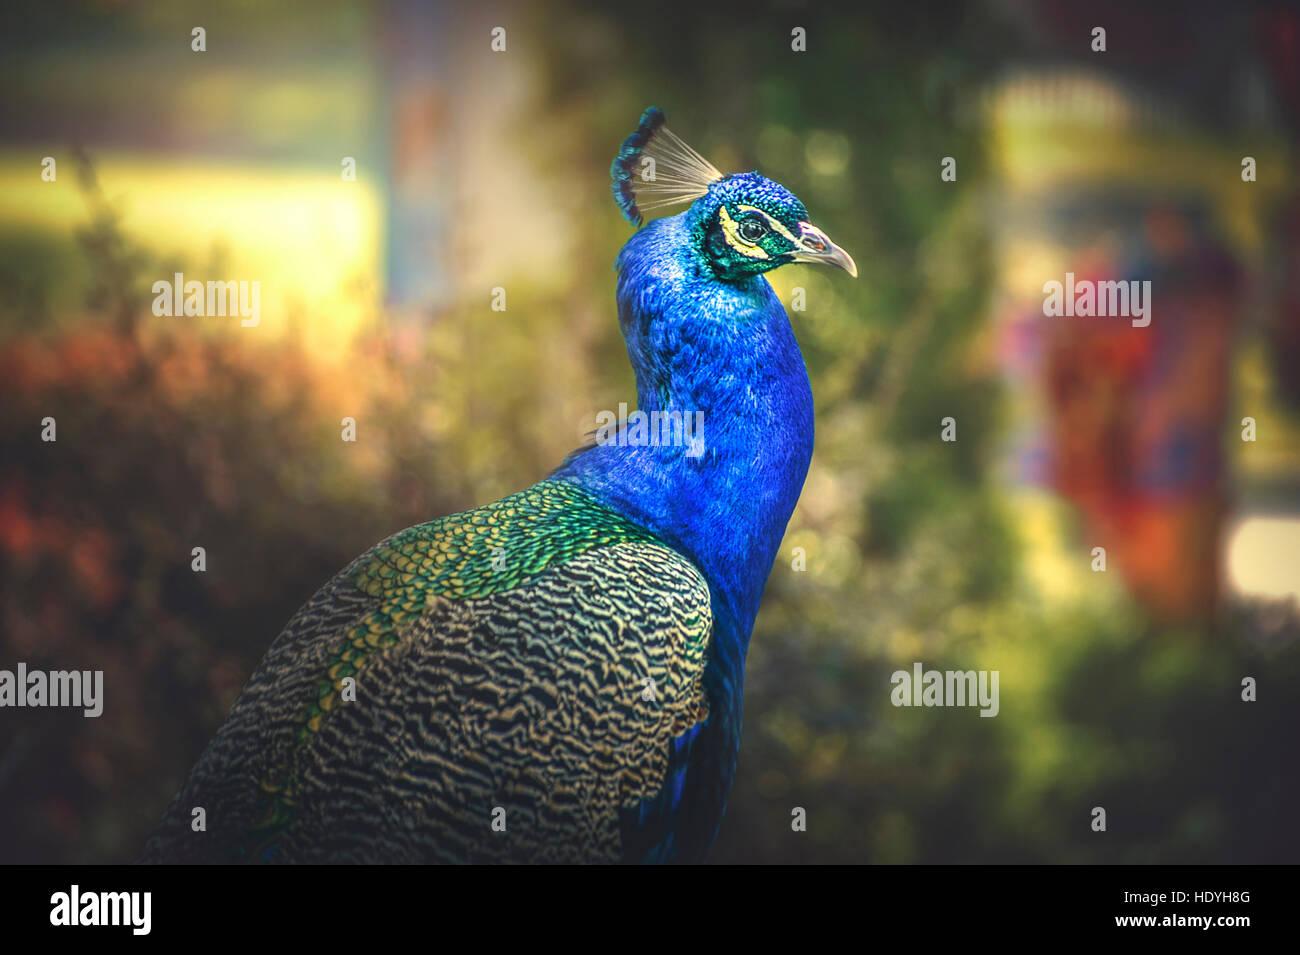 bird,nature,peacock,colors,artistic - Stock Image